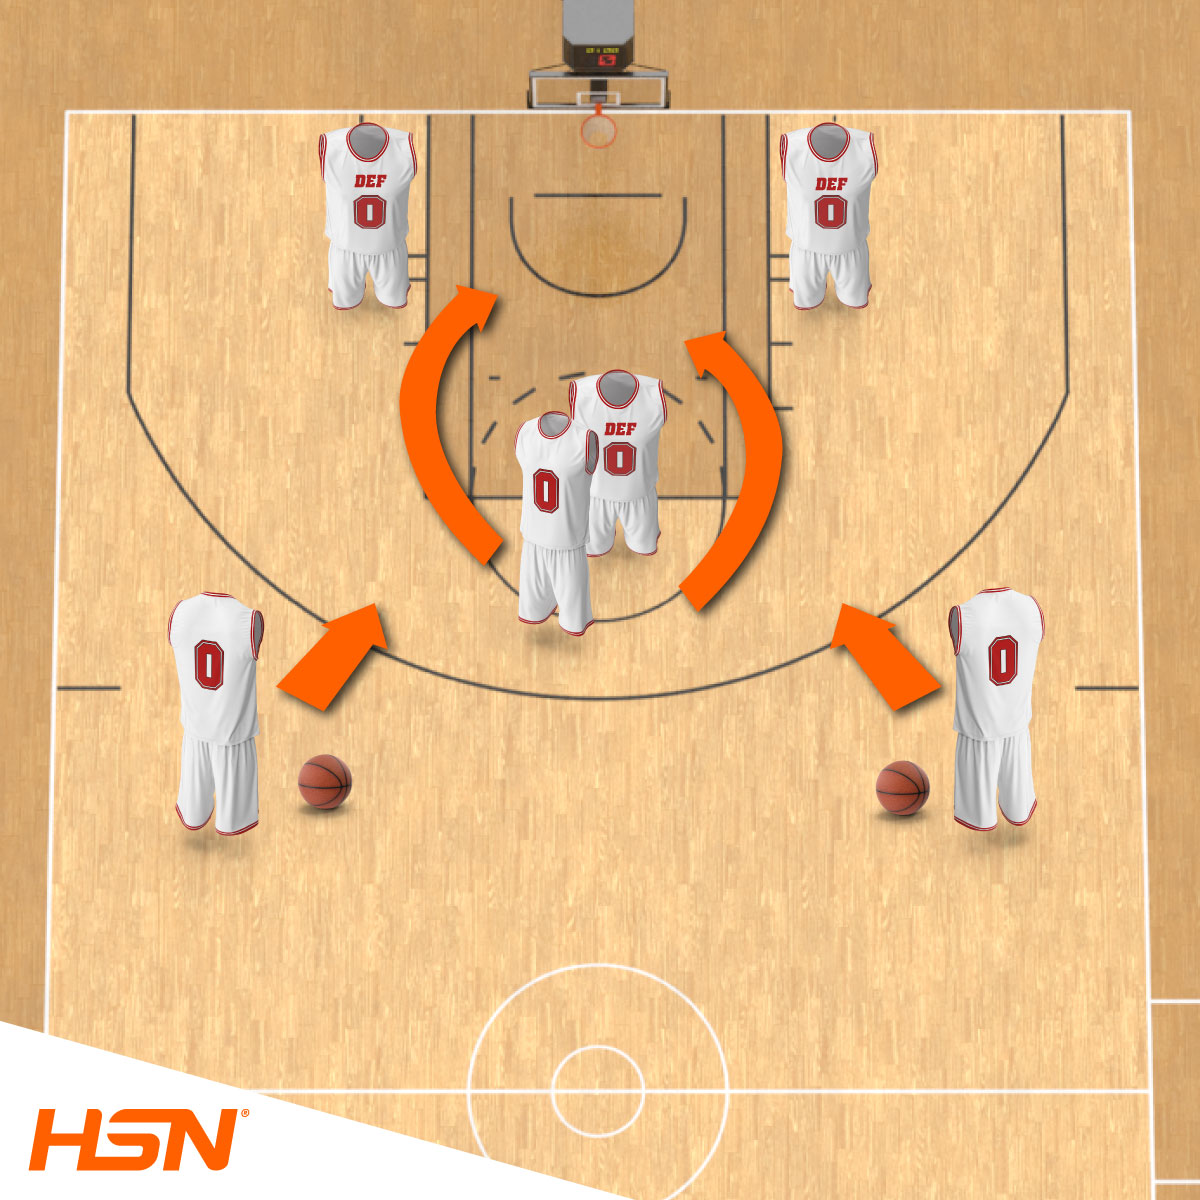 Treino funcional basquetebol poste